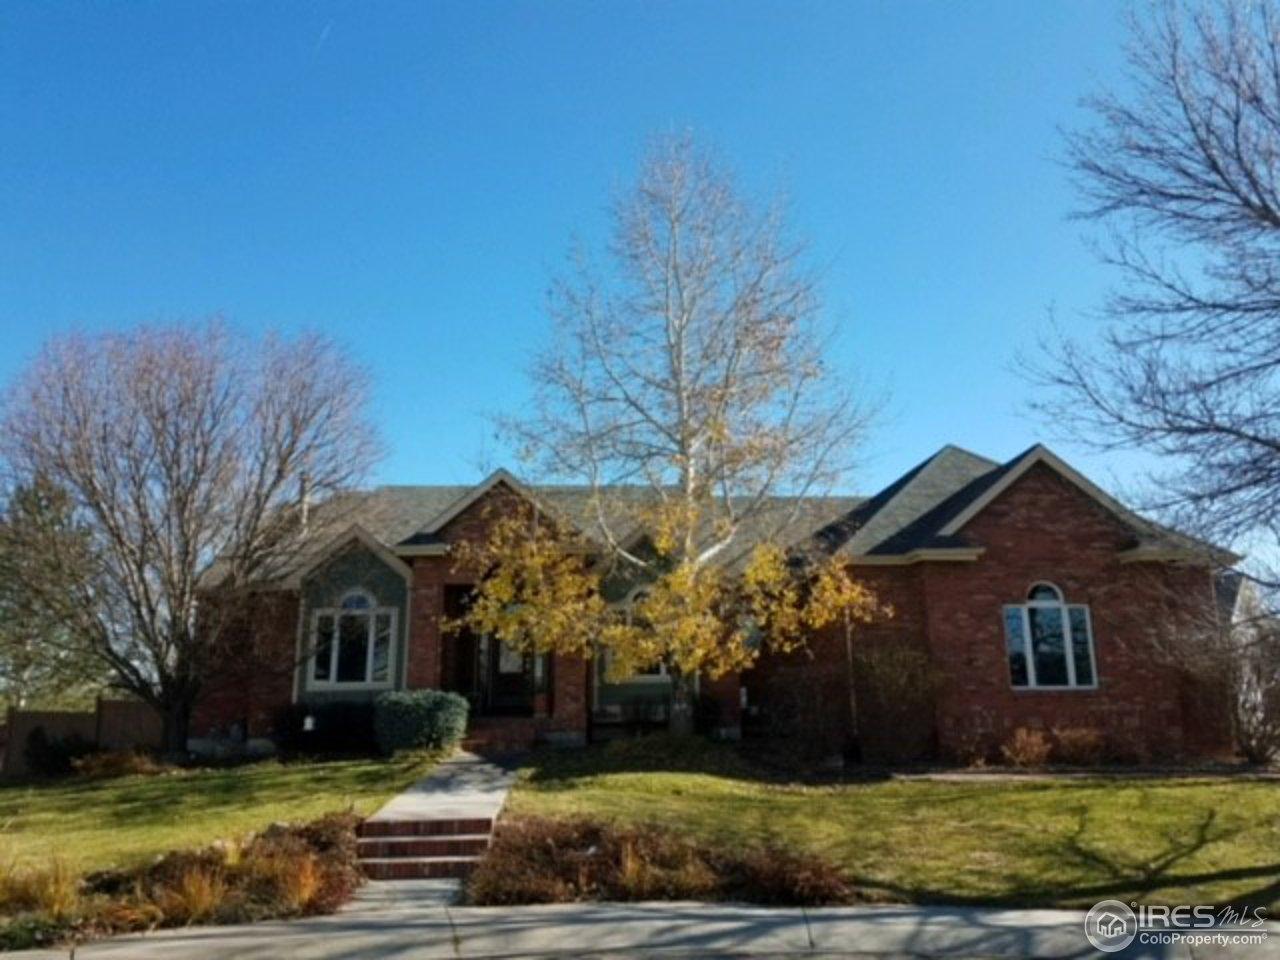 6006 Huntington Hills Ct, Fort Collins CO 80525